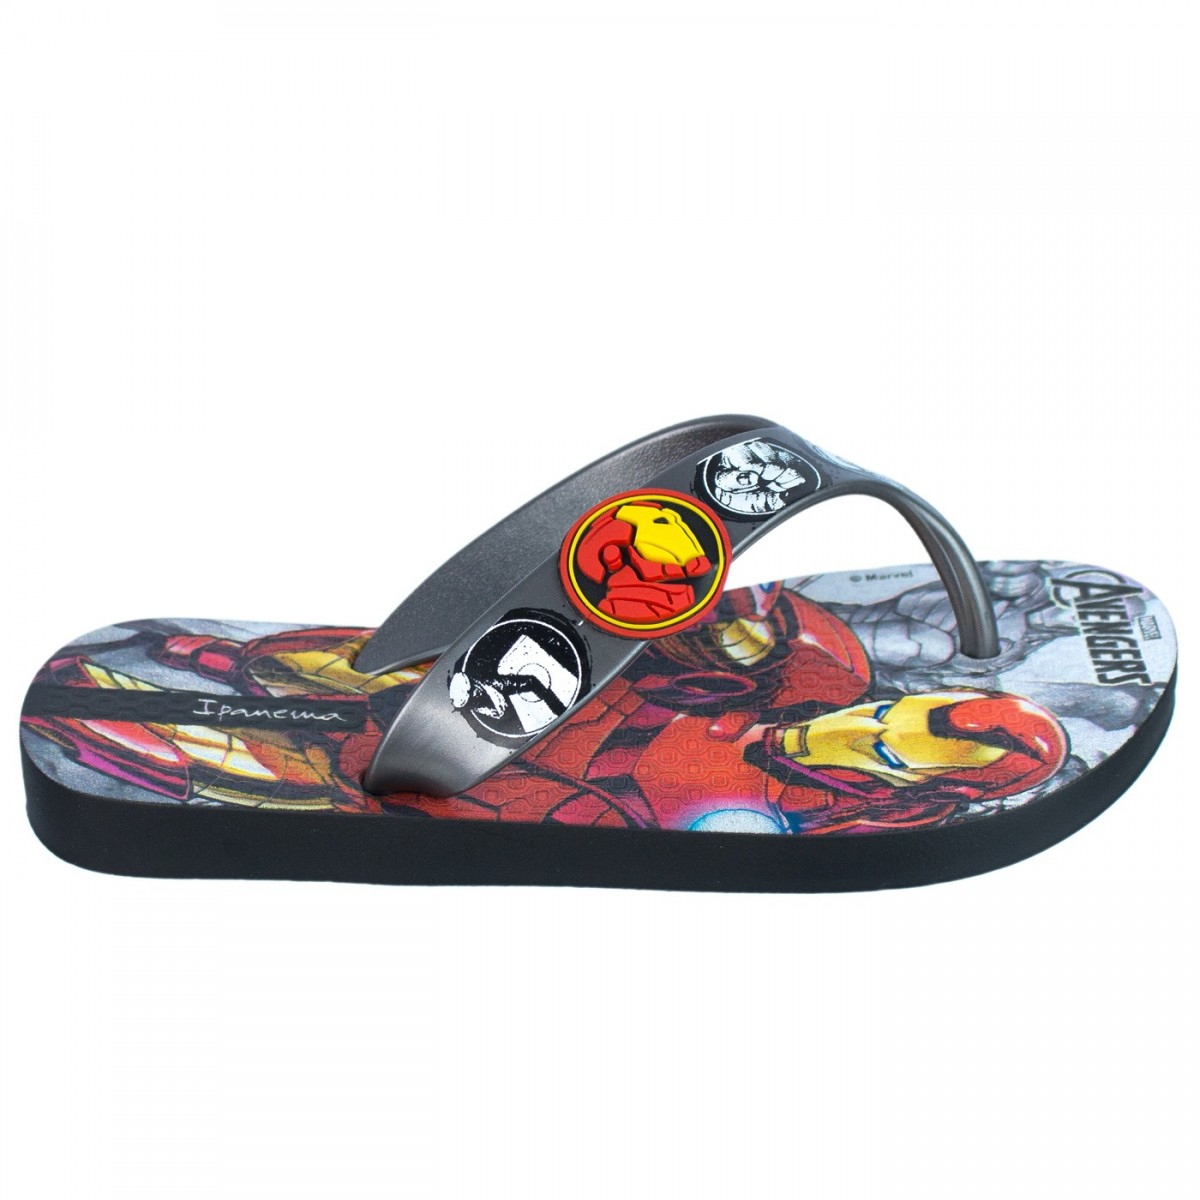 f8b5e9ca85 Bizz Store - Chinelo Infantil Masculino Grendene Ipanema Avengers